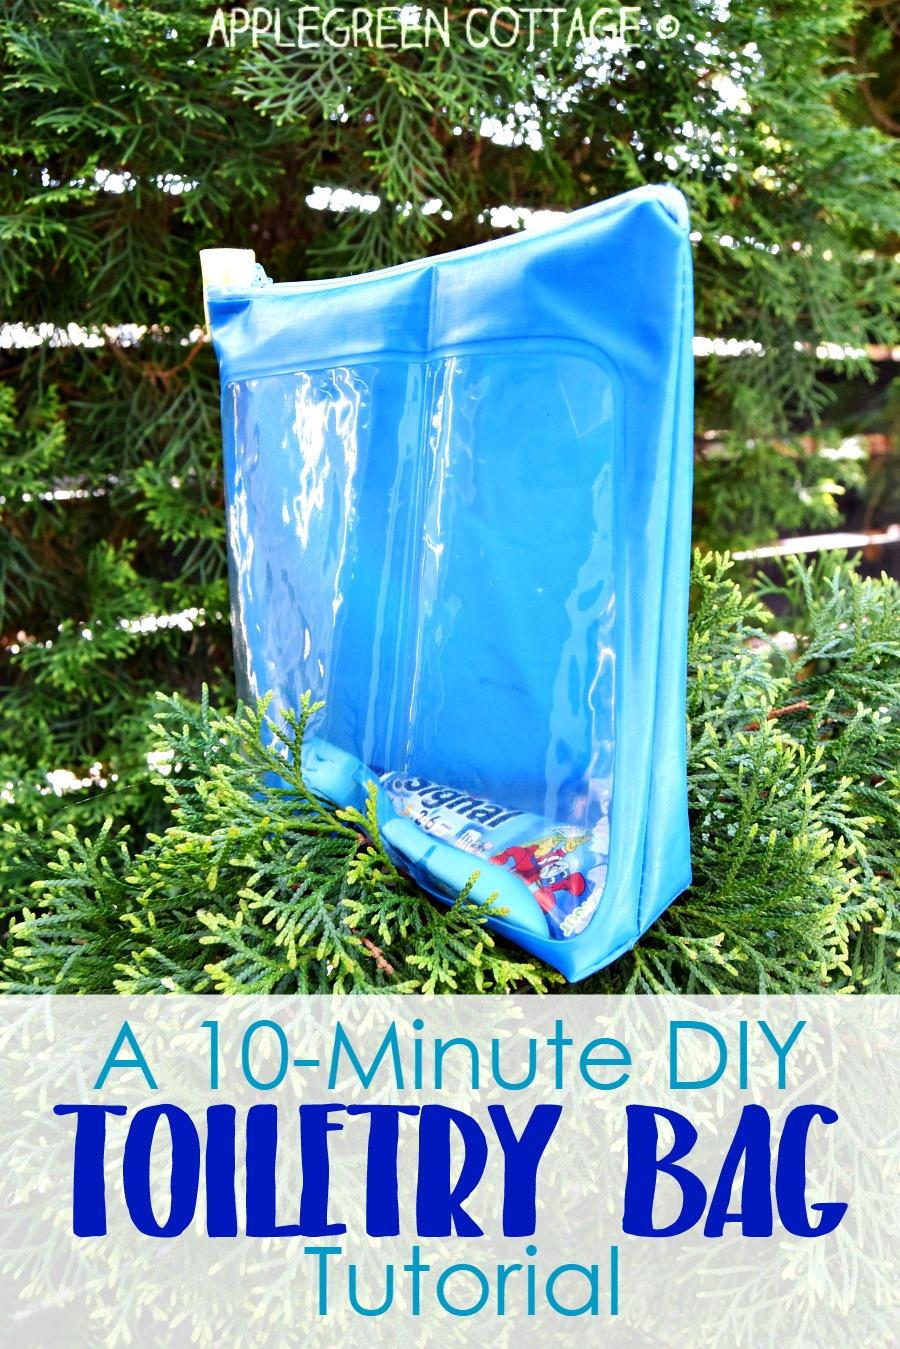 DIY Toiletry Bag Tutorial